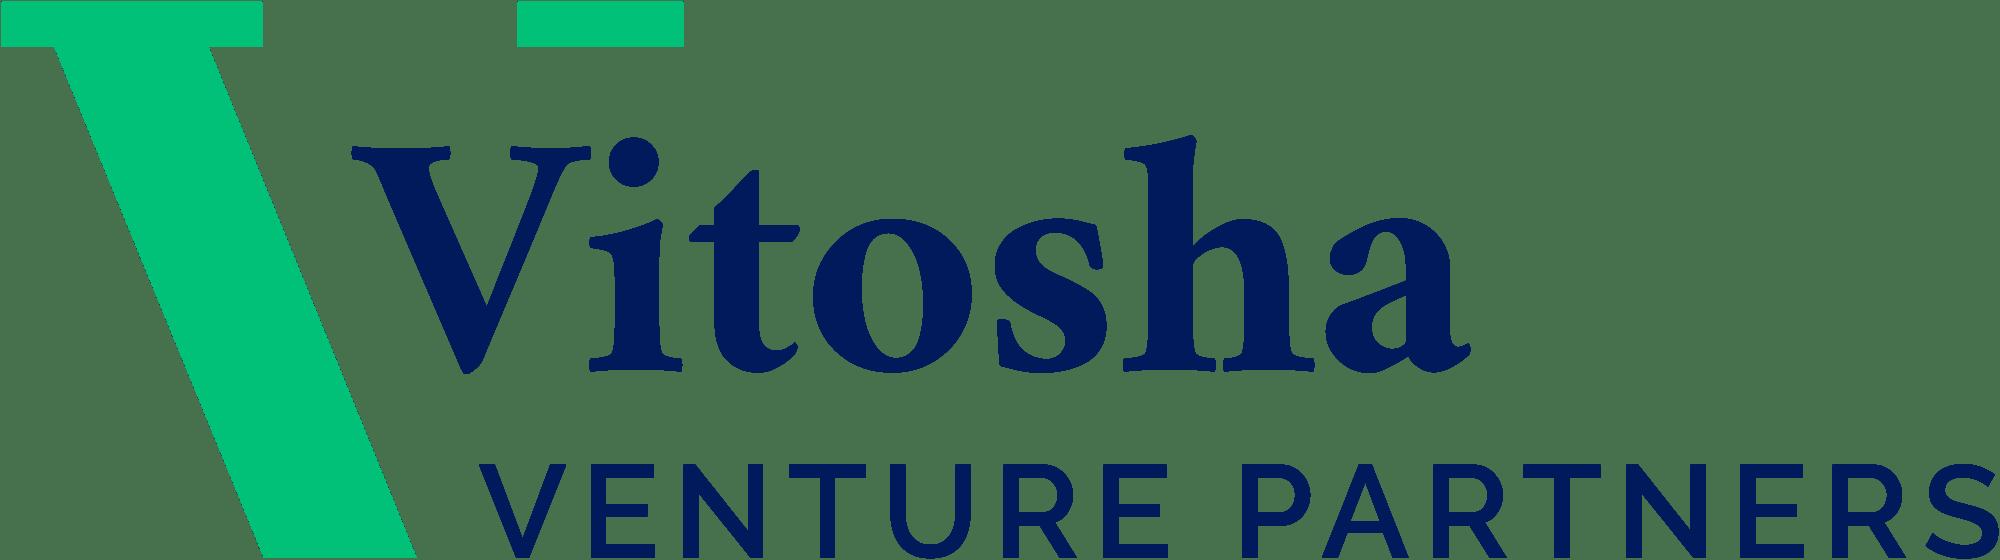 Vitosha Venture Partners